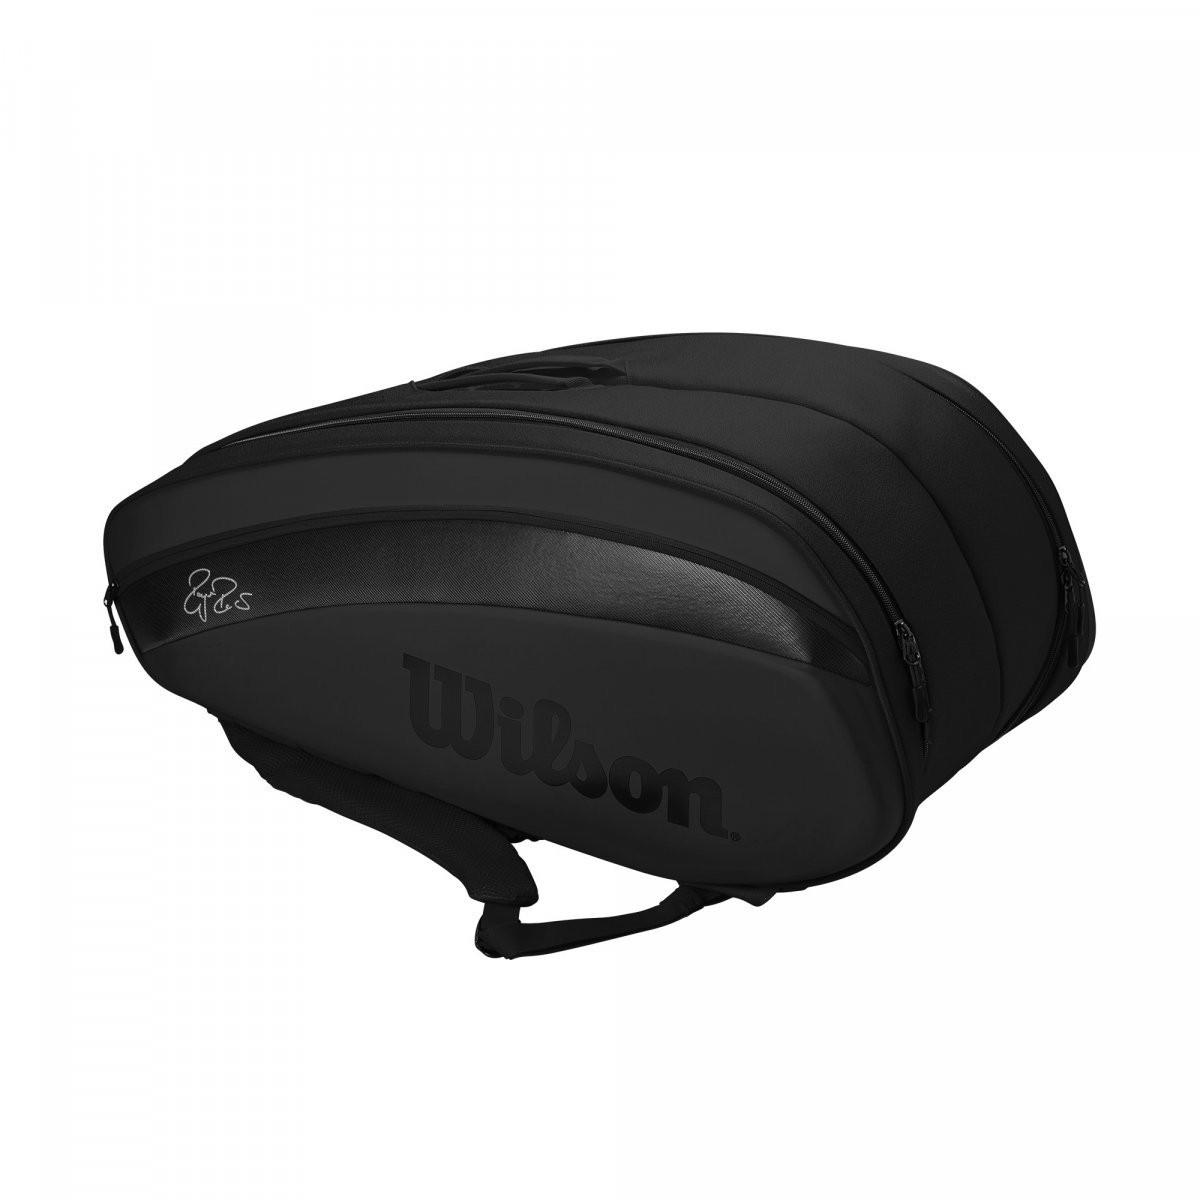 Теннисная сумка Wilson Federer DNA 12 Pk Bag 2020 black